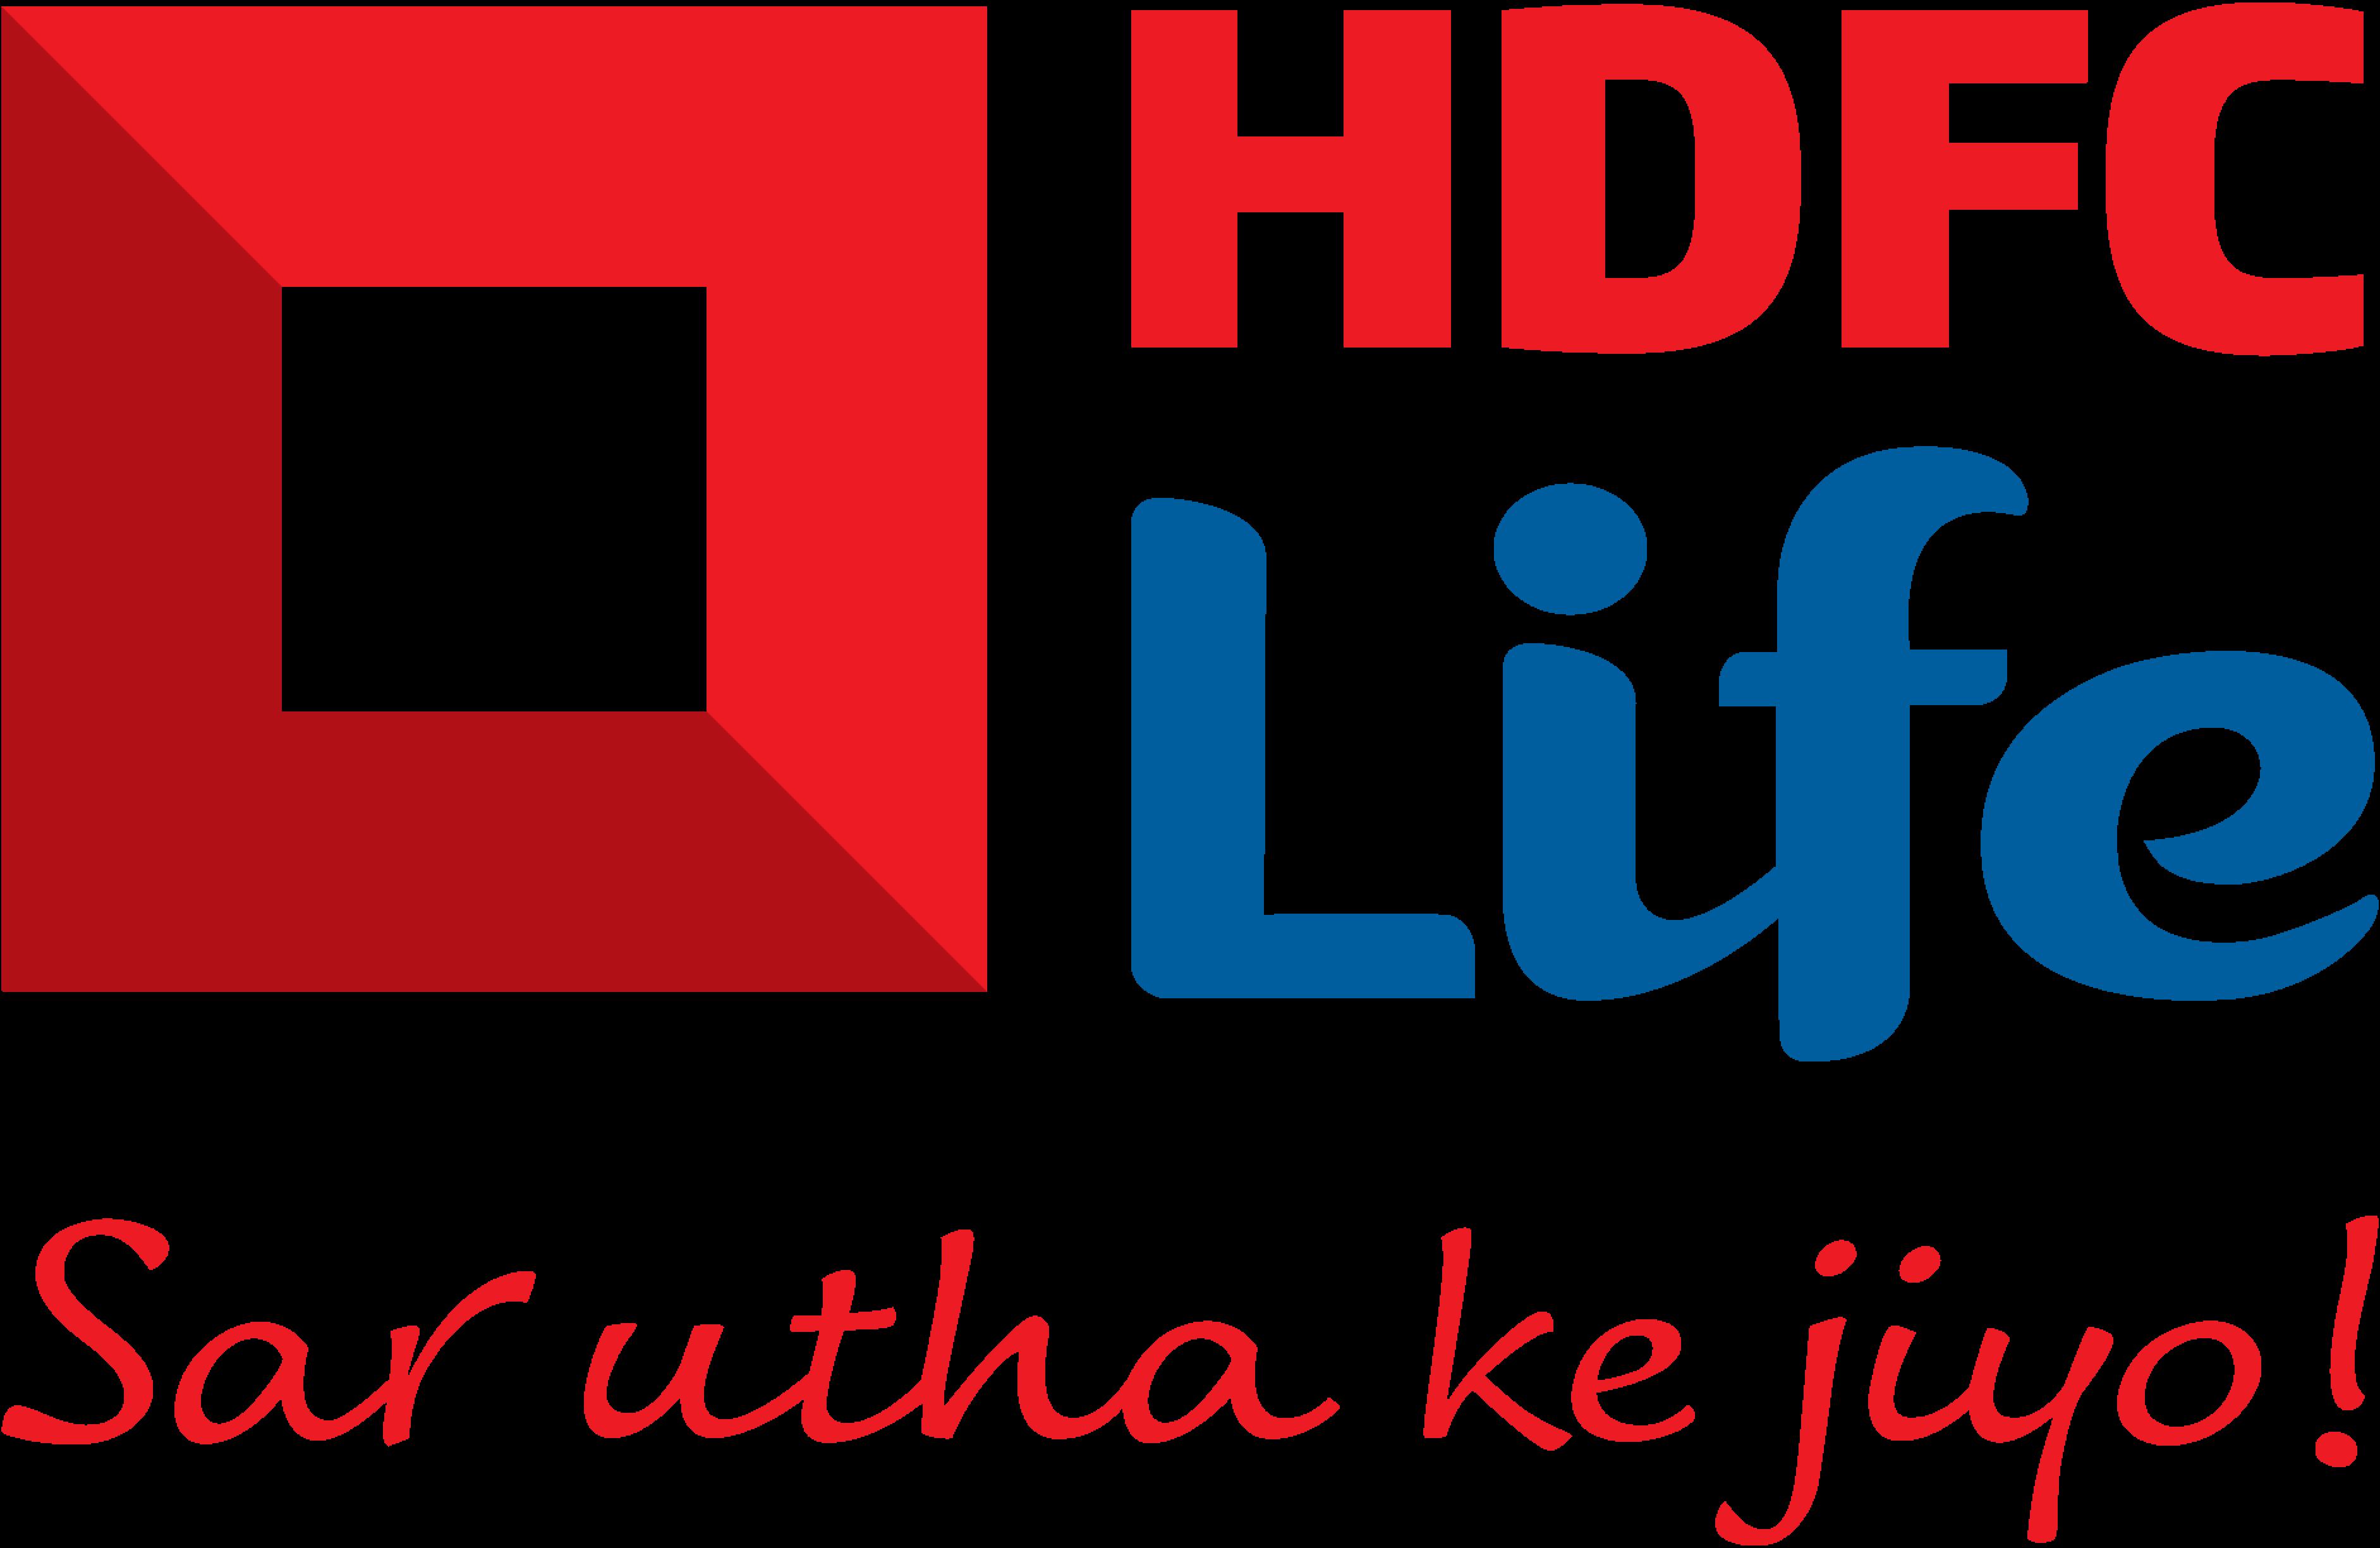 Hdfc Life Insurance >> HDFC Life - Logopedia, the logo and branding site